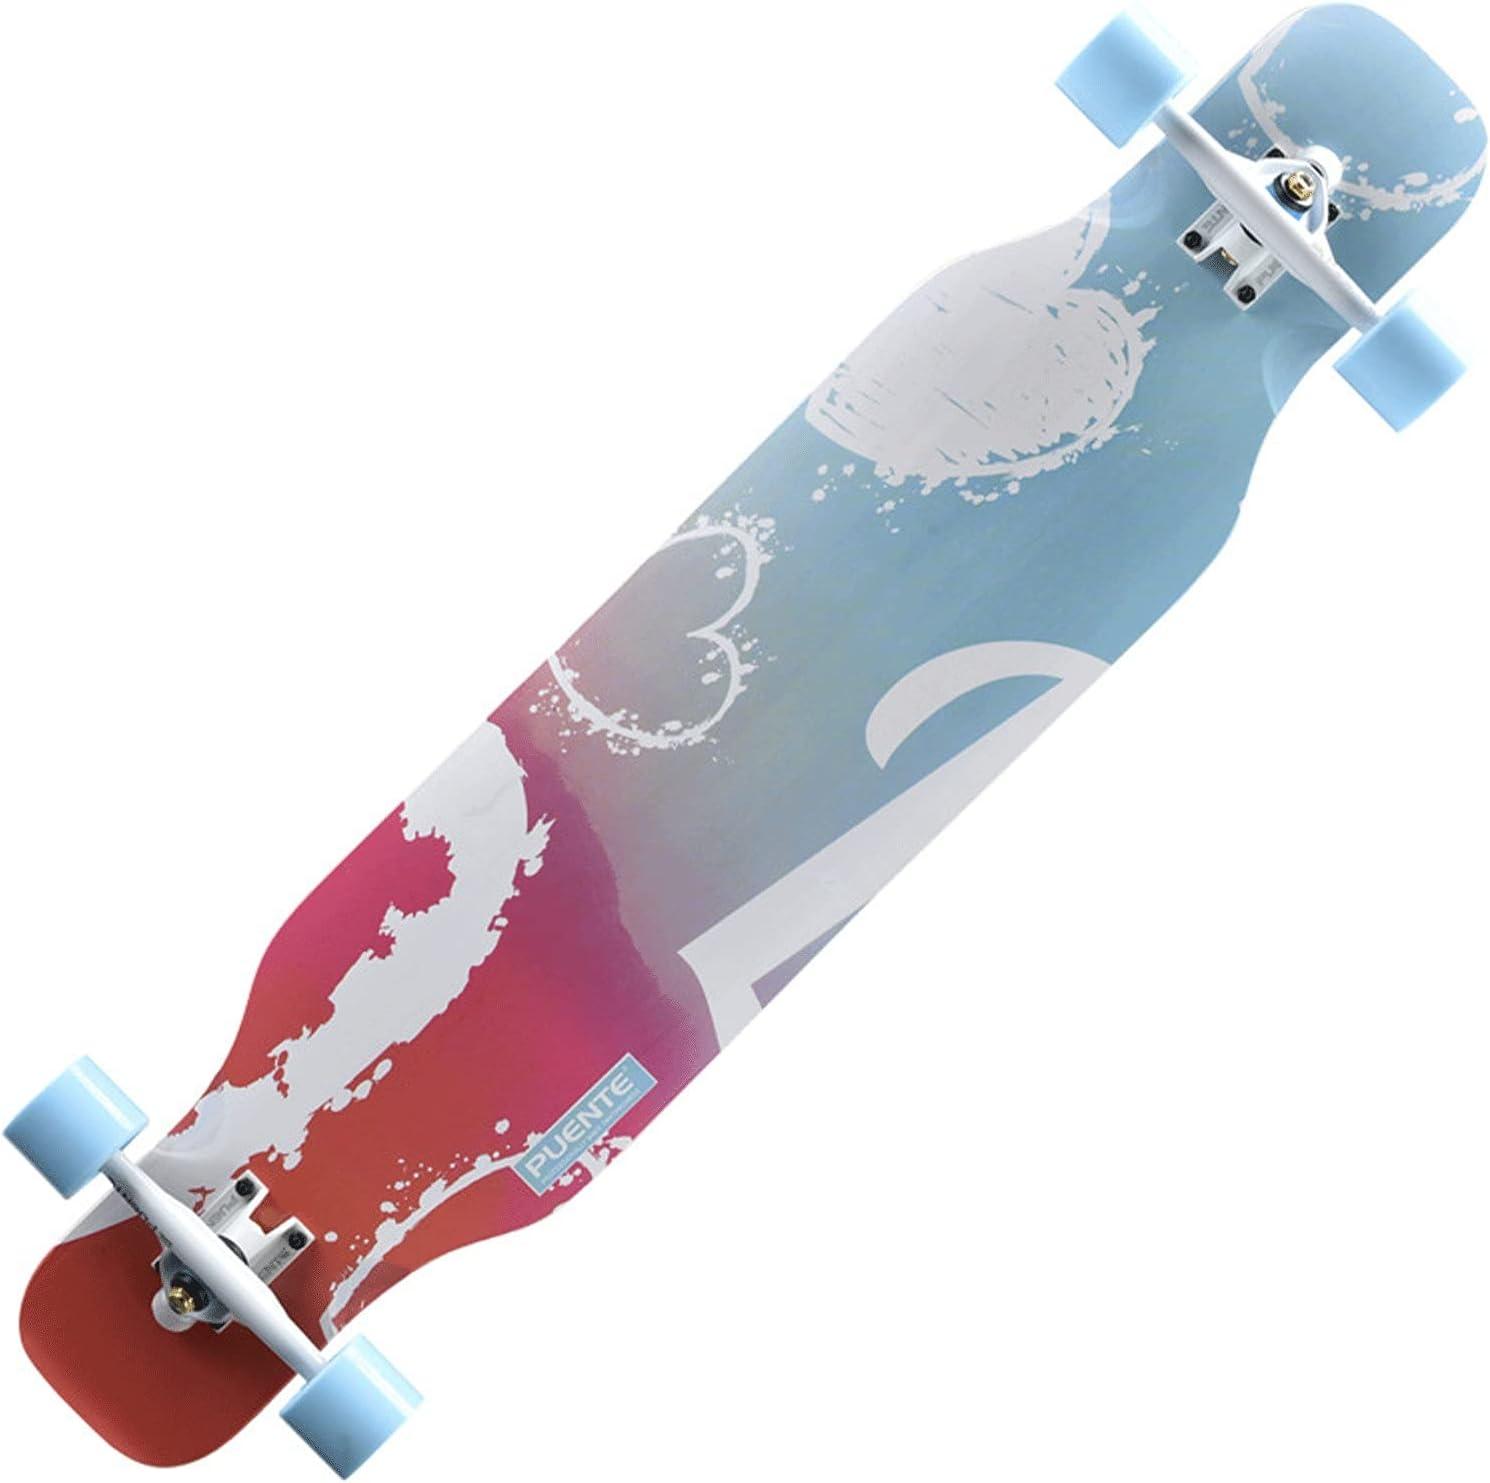 EEGUAI 42inch Freeride San Antonio Mall Longboard 7-Ply Lowest price challenge Maple Natural Skateboard